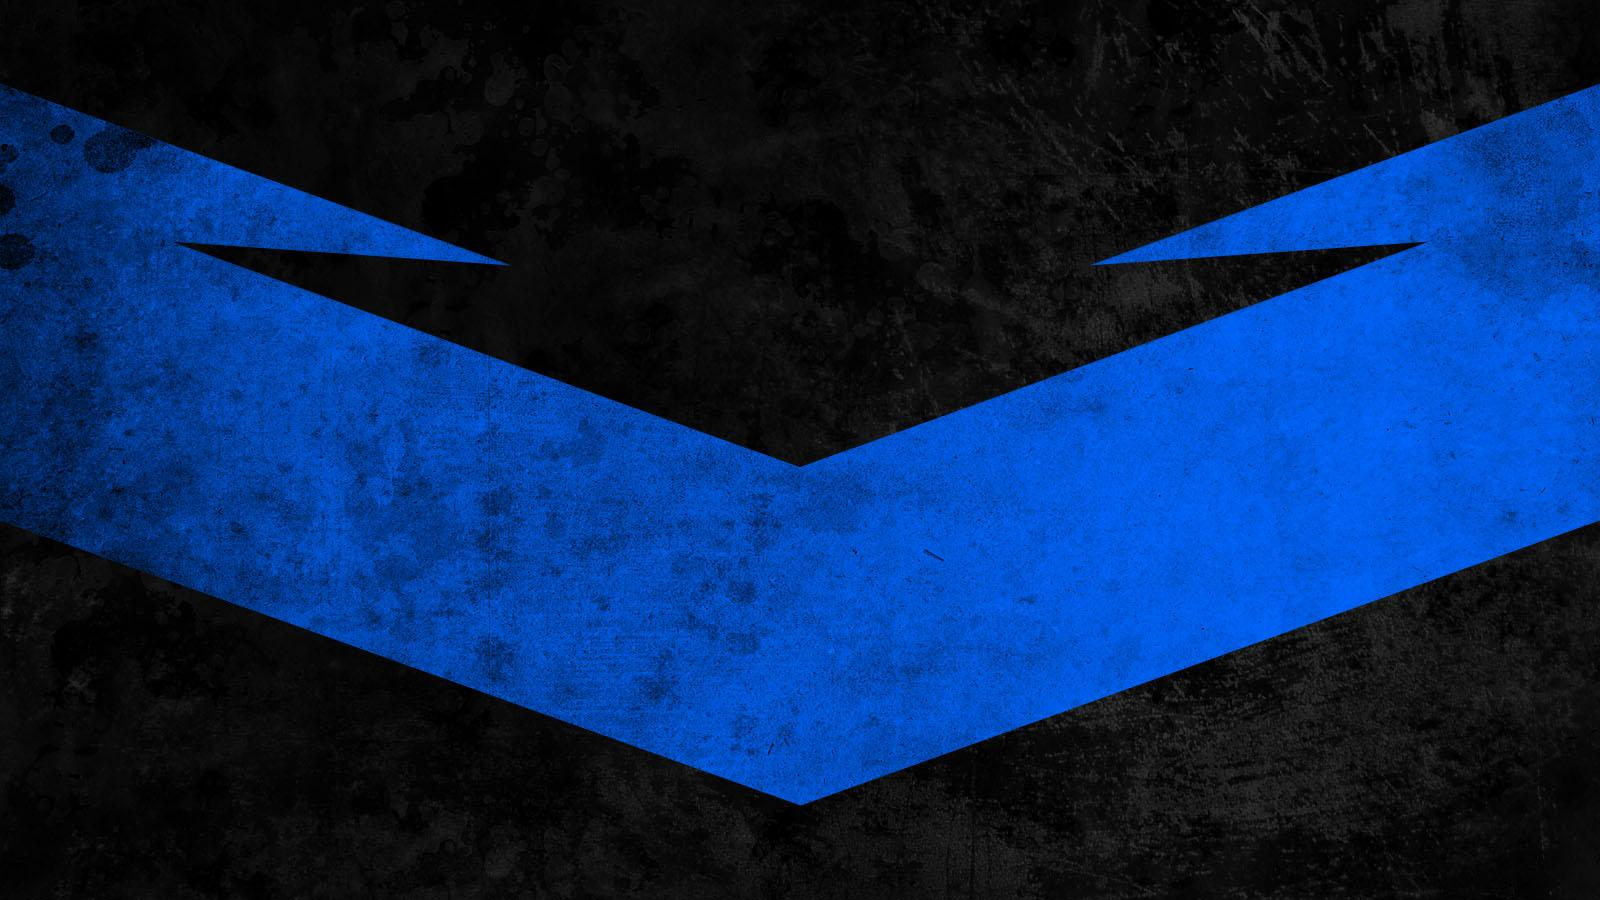 Nightwing Wallpaper Phone - WallpaperSafari